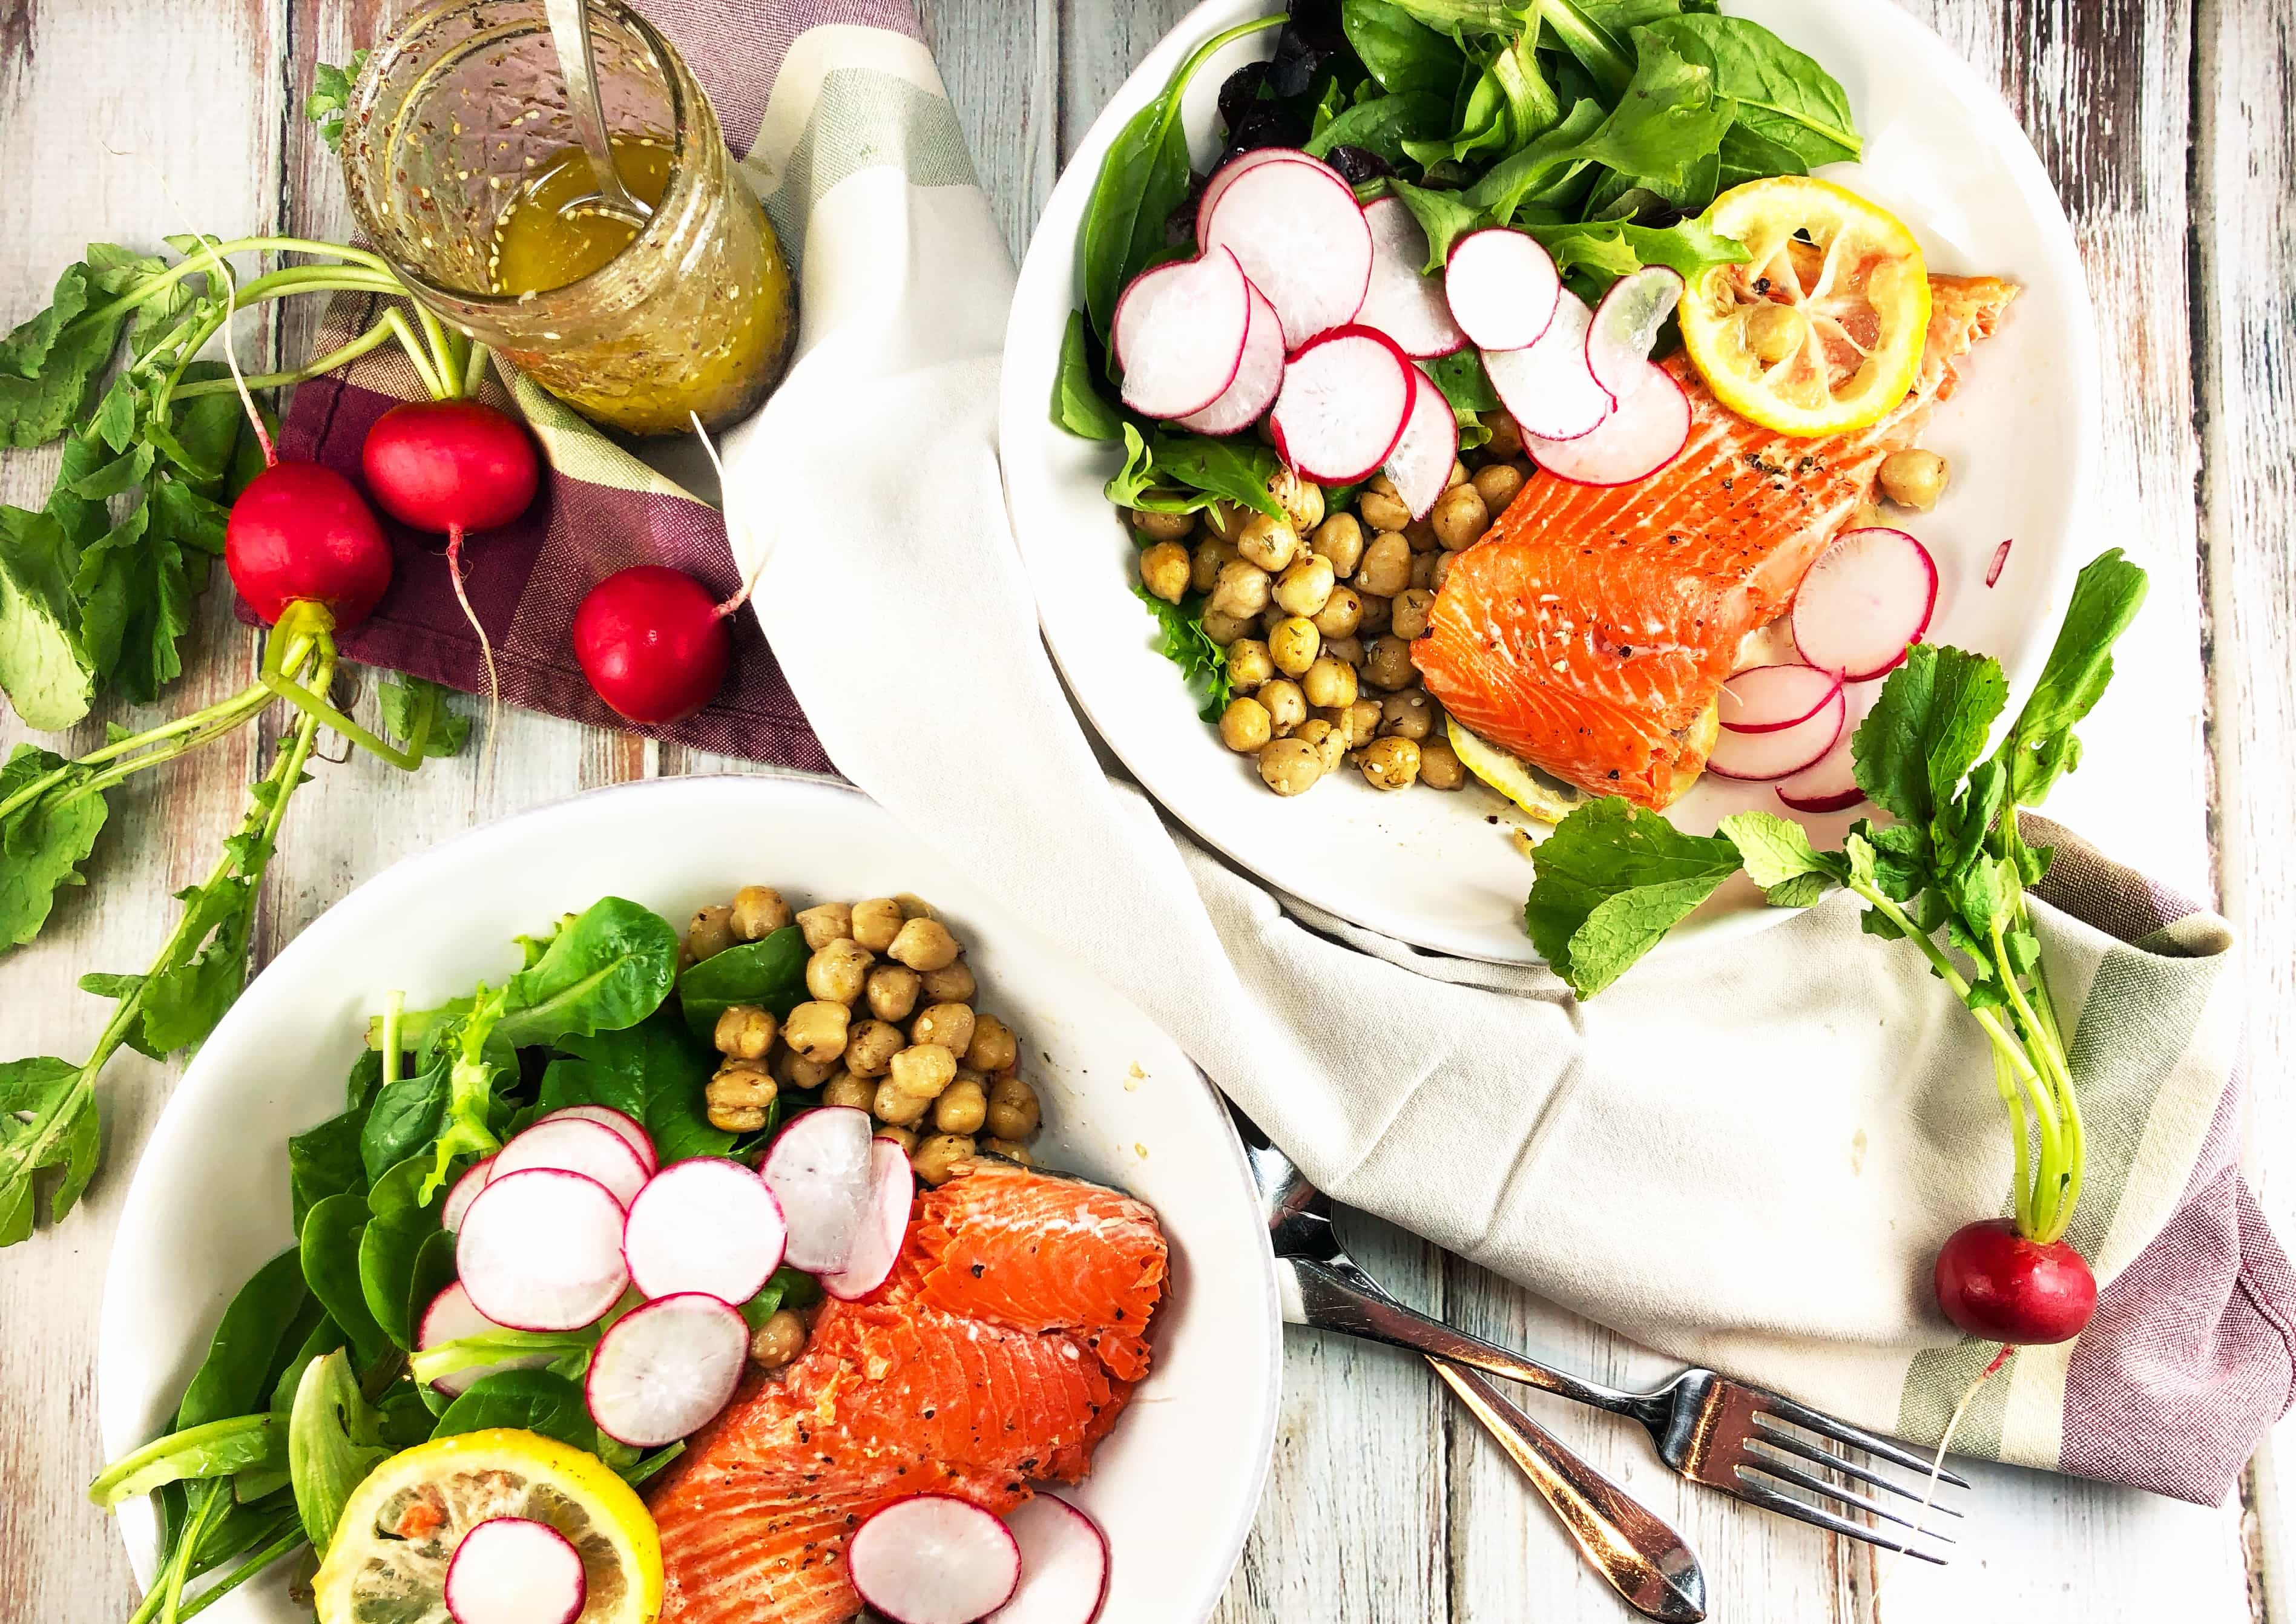 Healthy Bowl Lemony Salmon with Za'atar Spiced Chickpeas